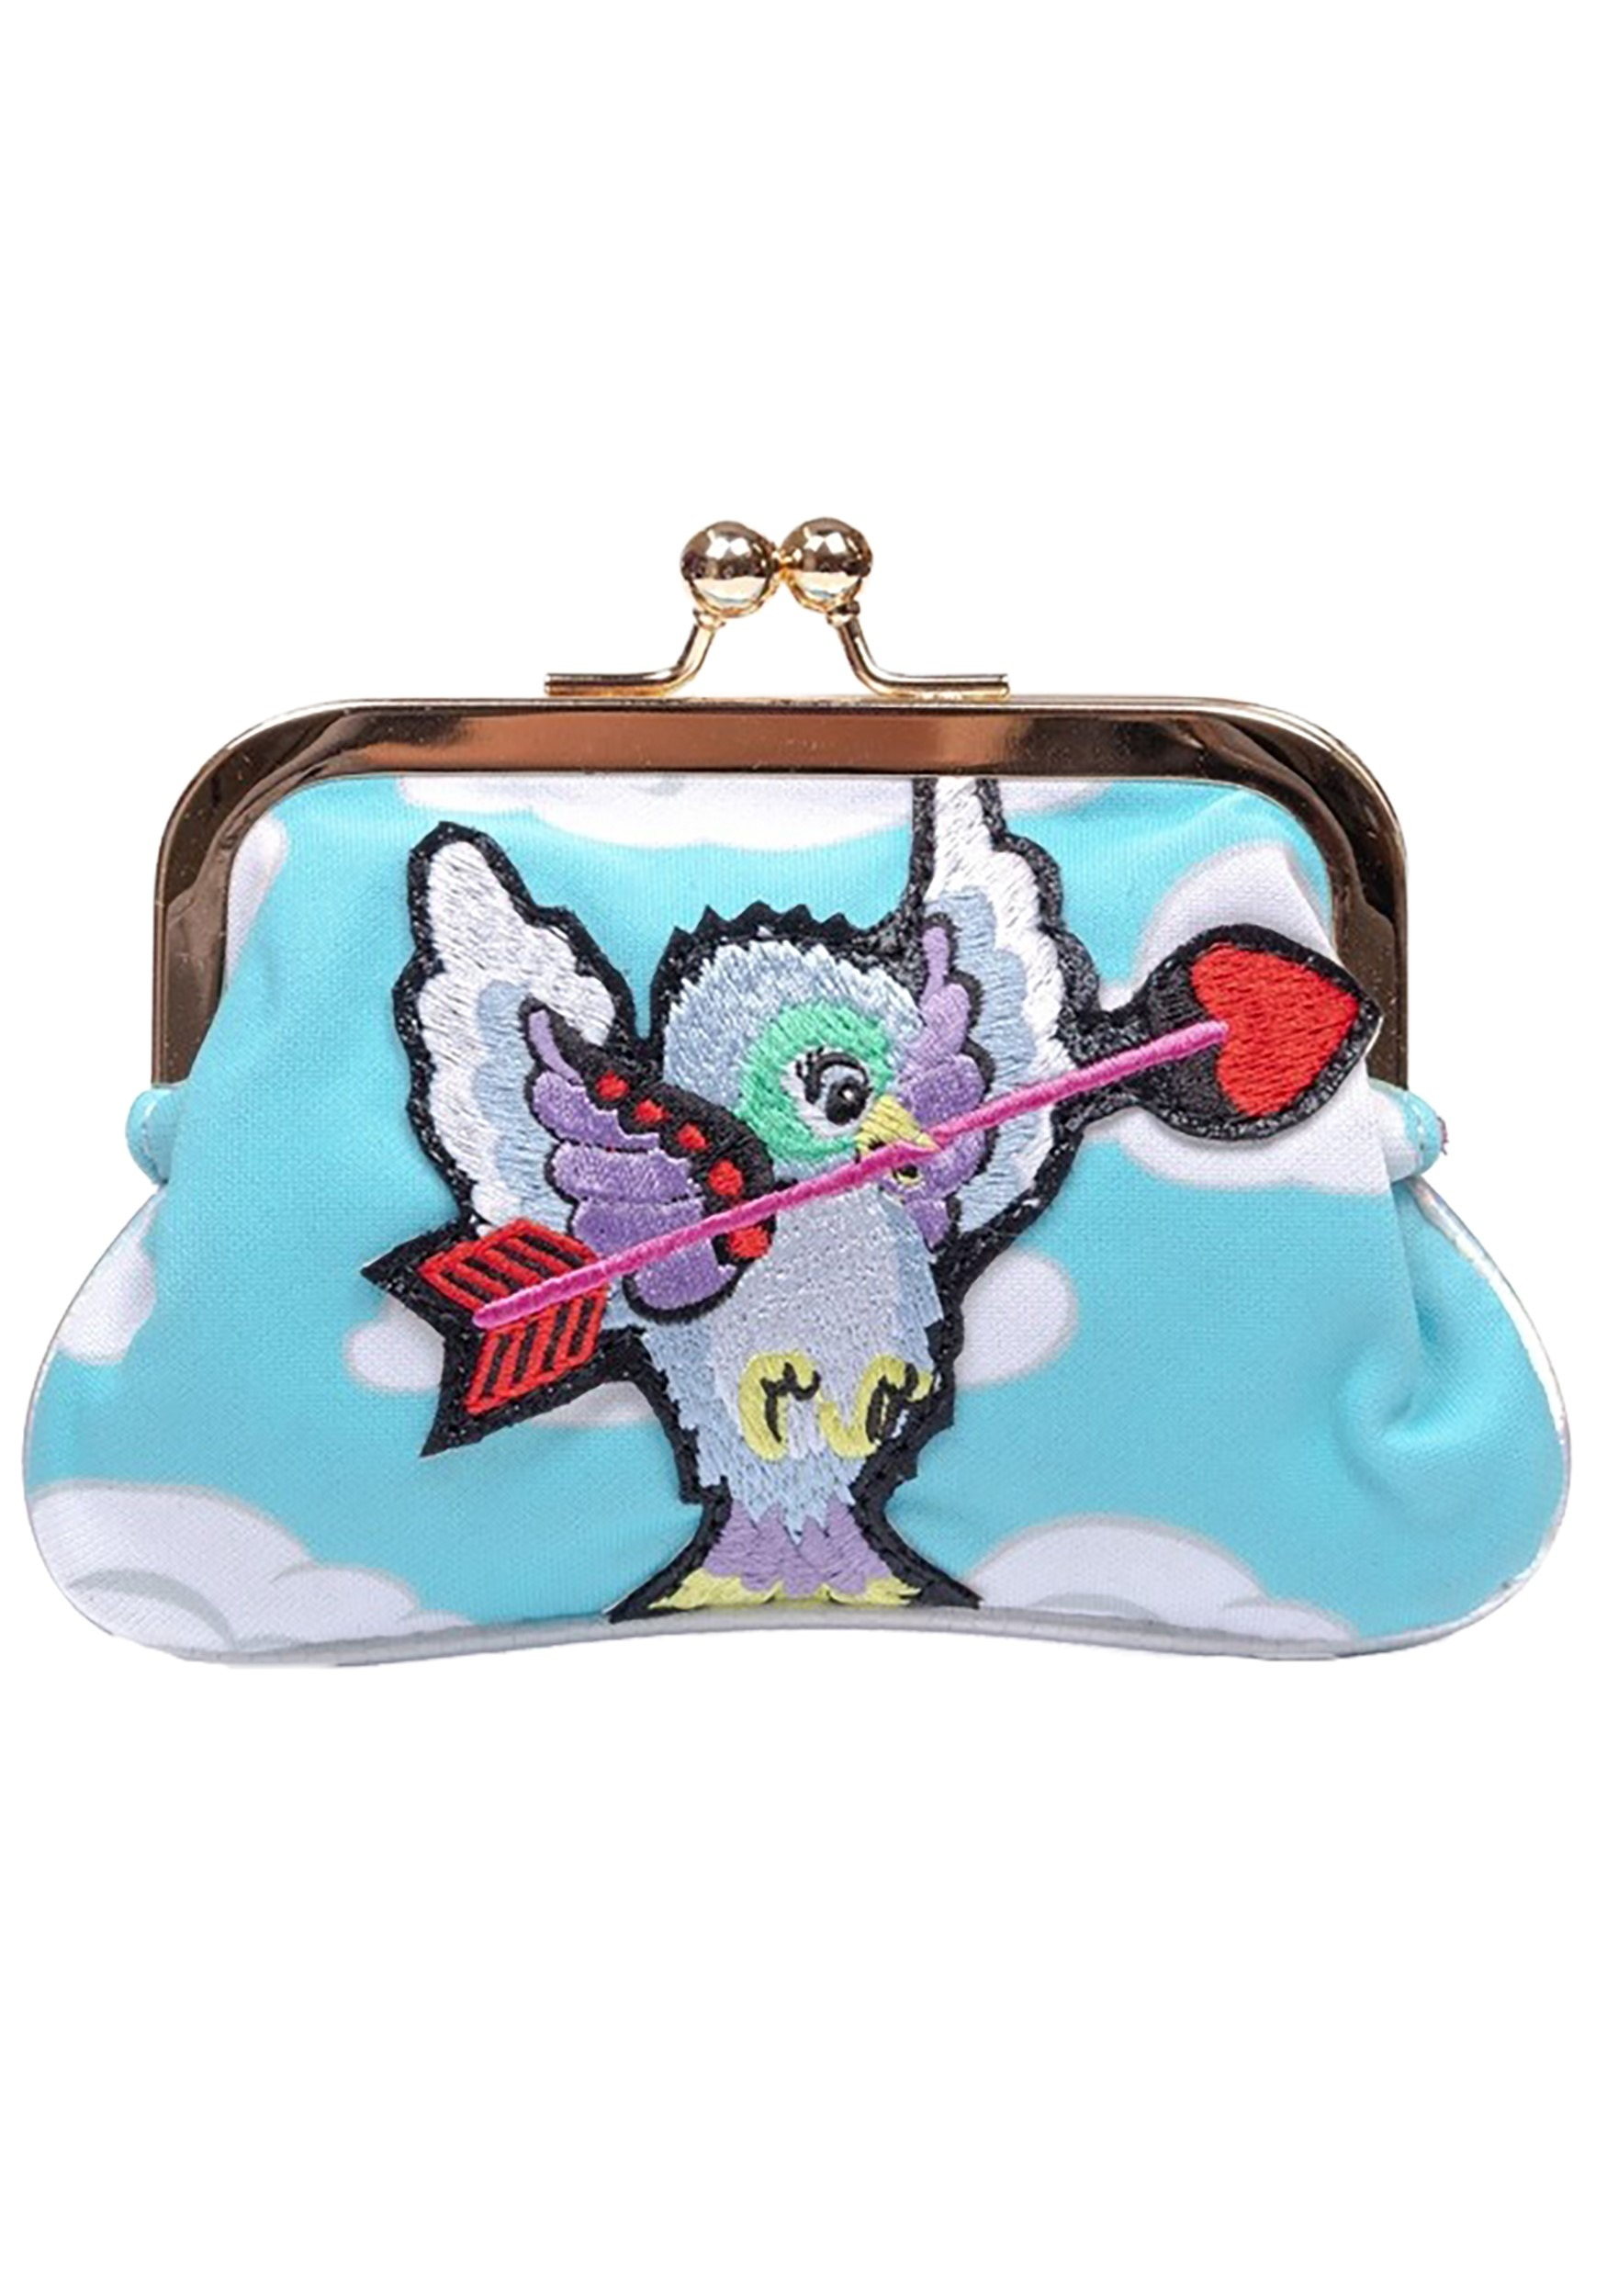 Irregular Choice Cupid Bird Coin Bag Purse